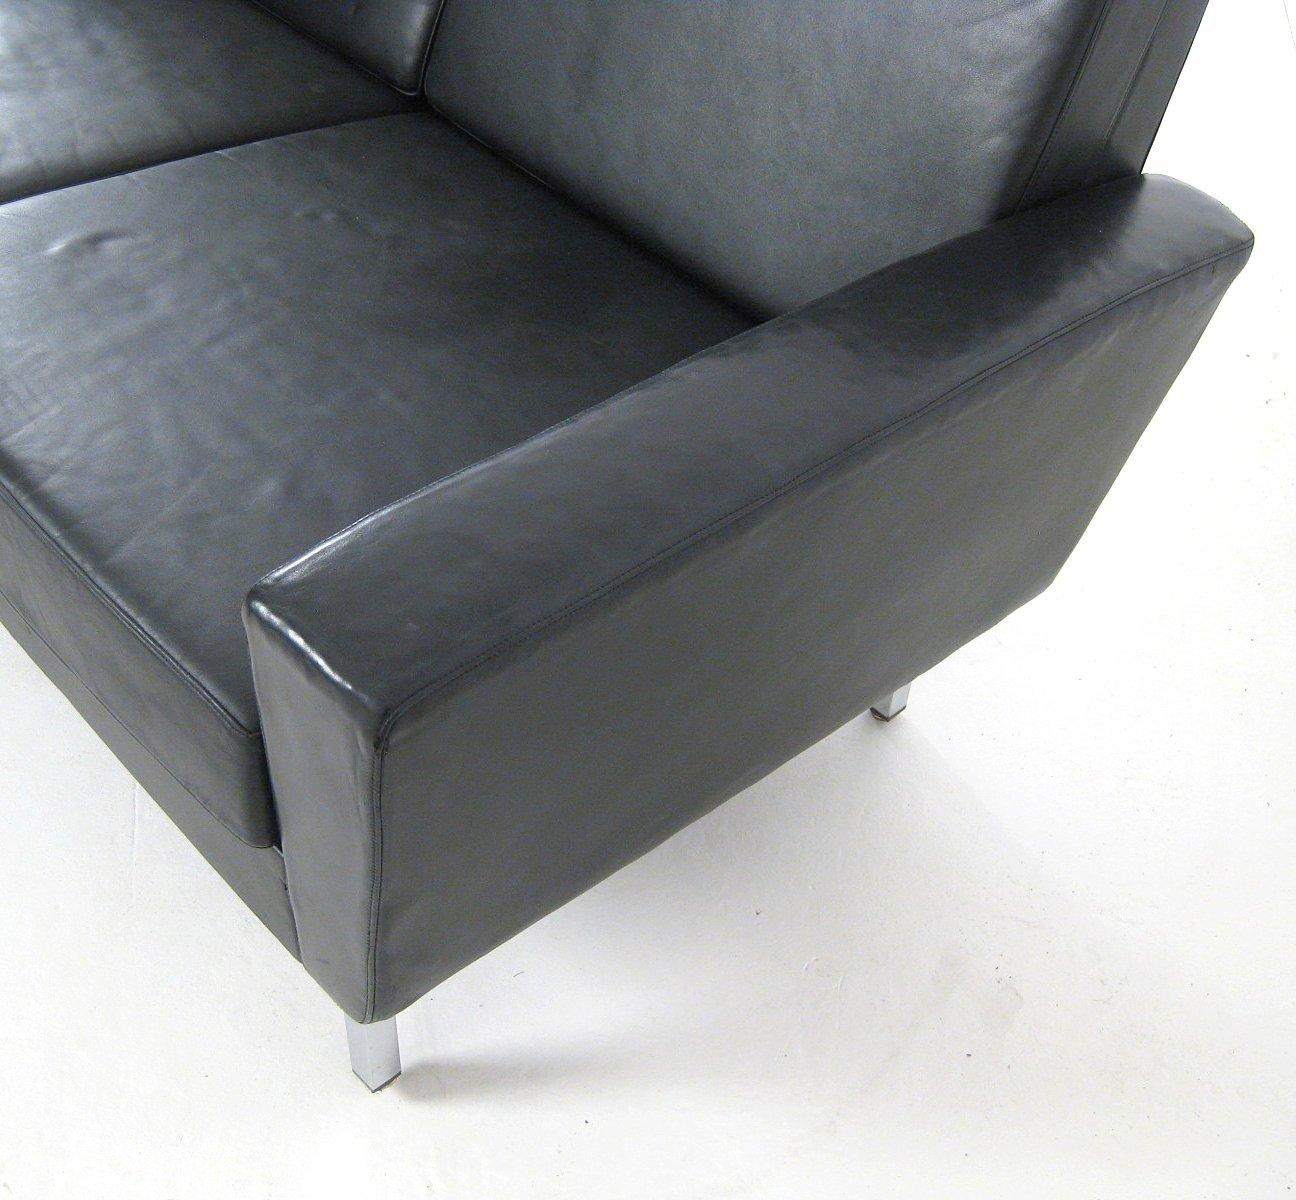 canap 4 places en cuir 1960s en vente sur pamono. Black Bedroom Furniture Sets. Home Design Ideas